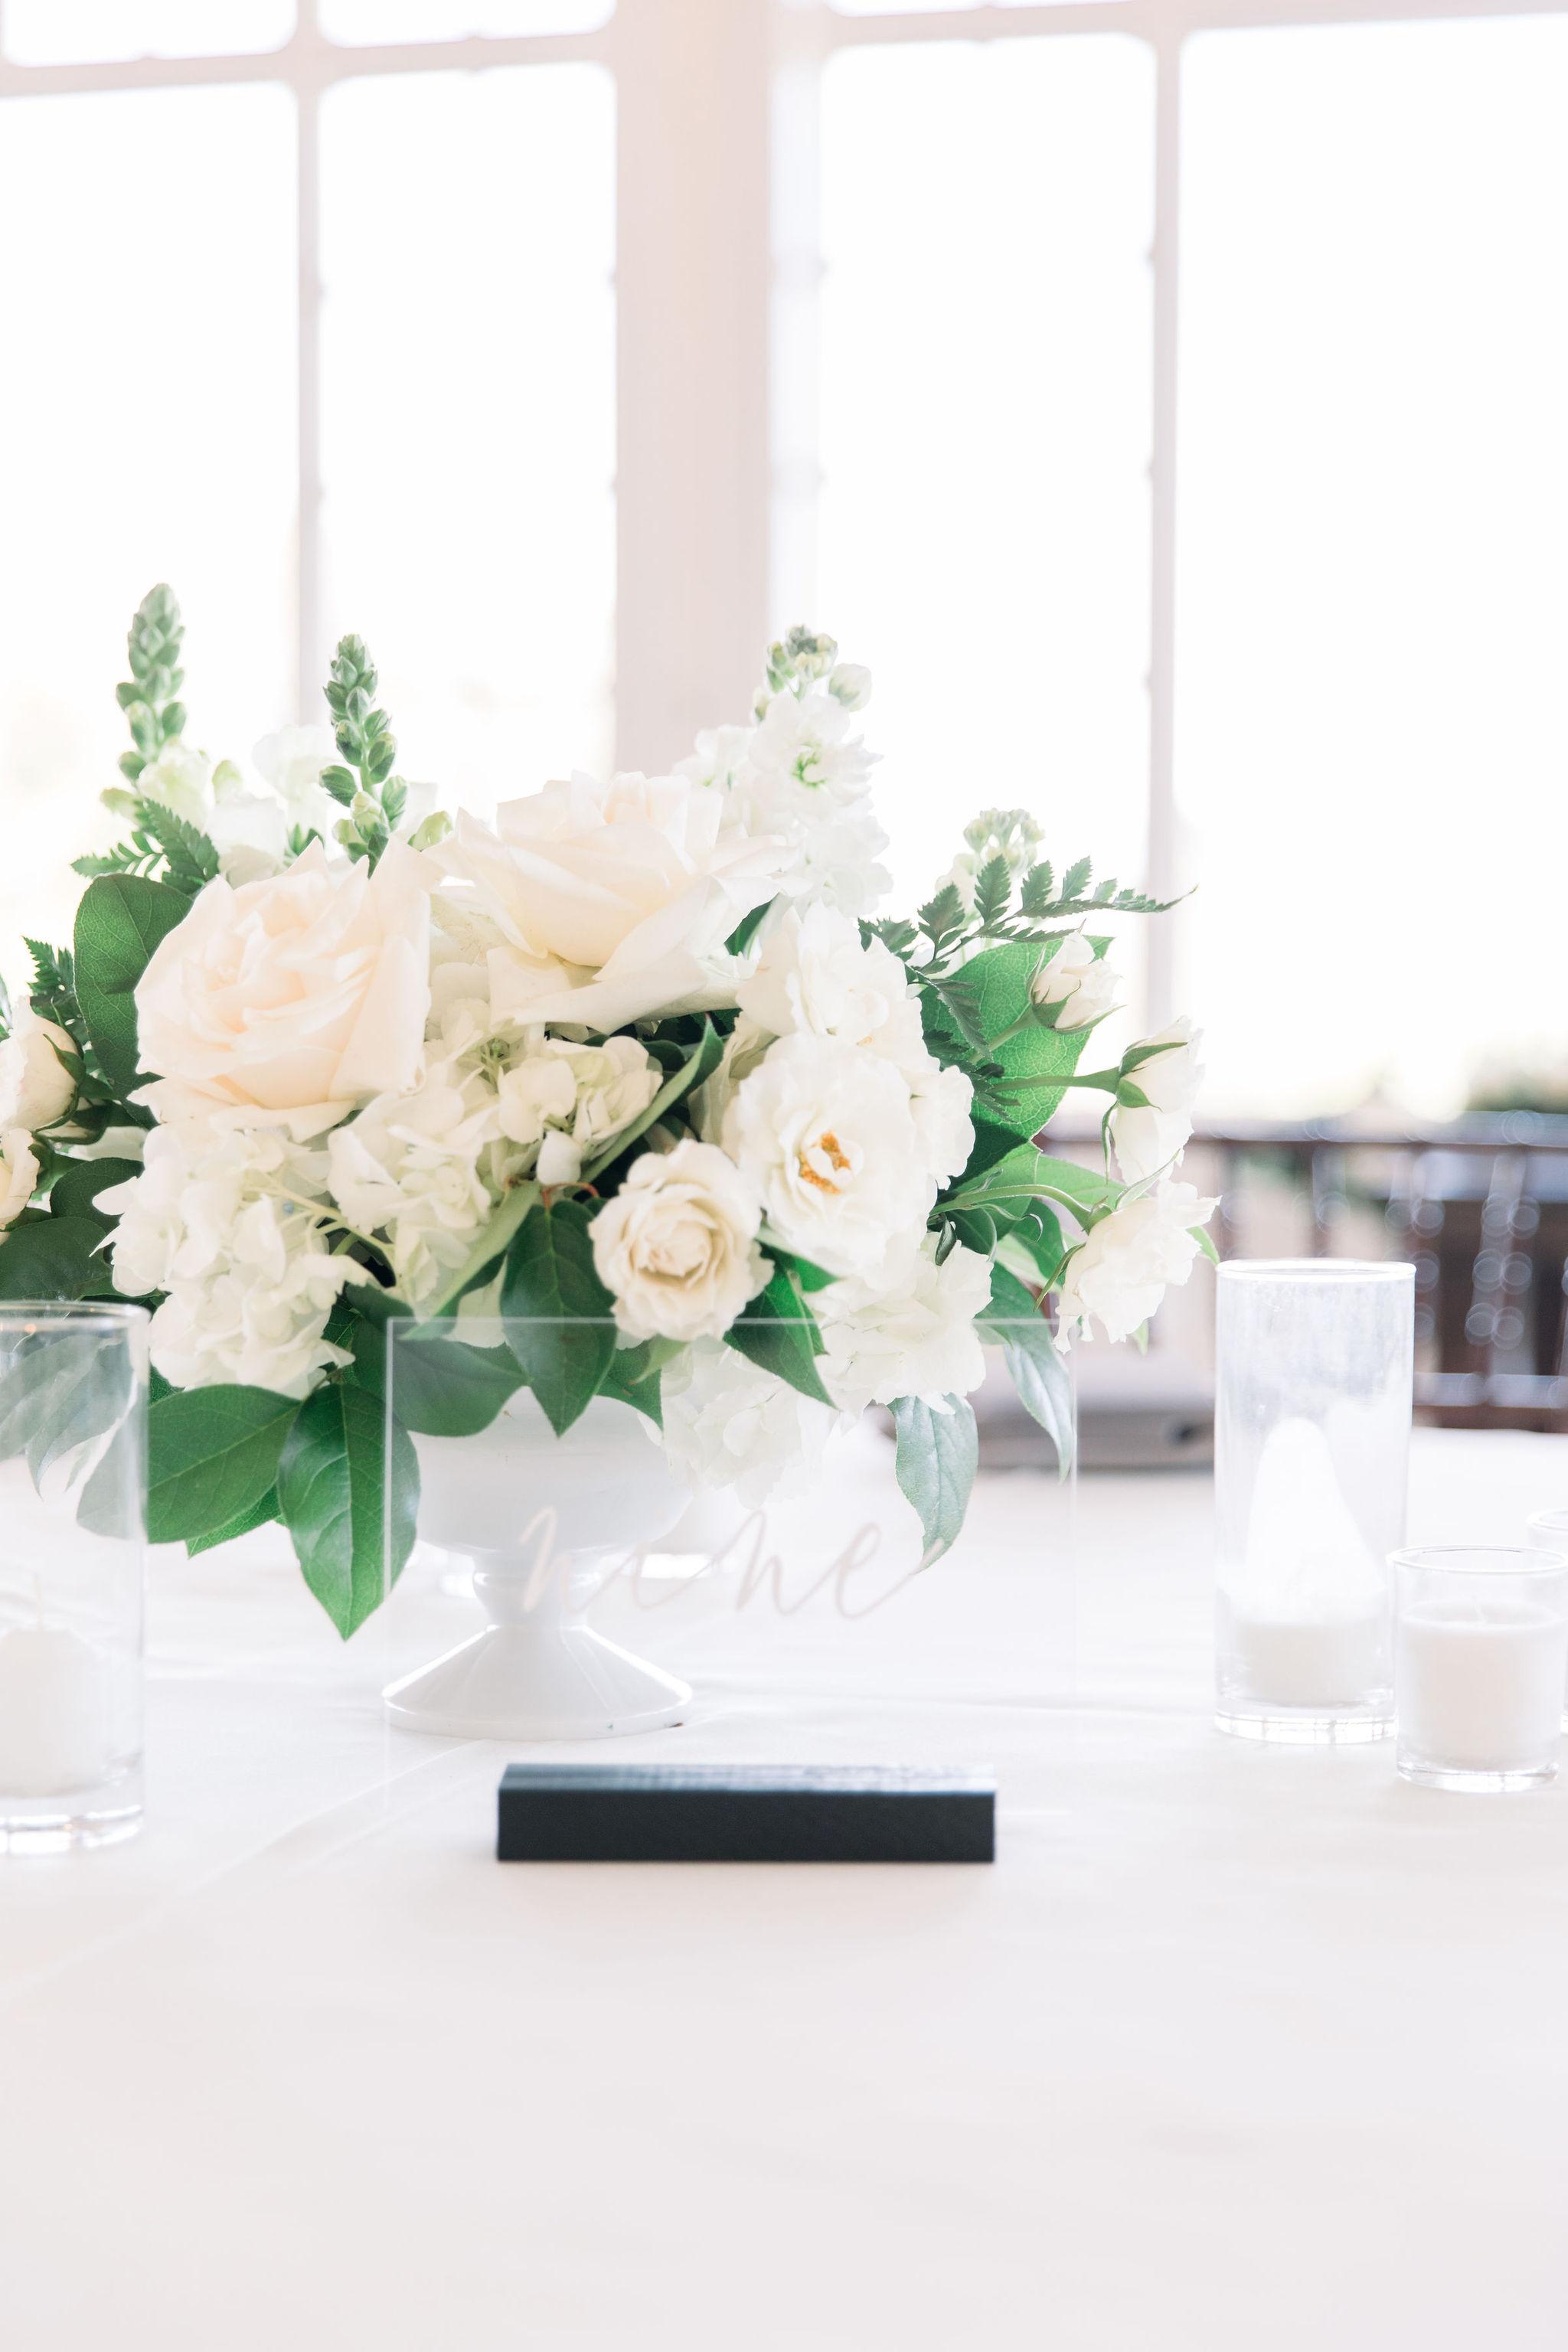 sydney-bodi-wedding-budget-friendly-blooms-carmel-mountain-white-flowers-4.jpg